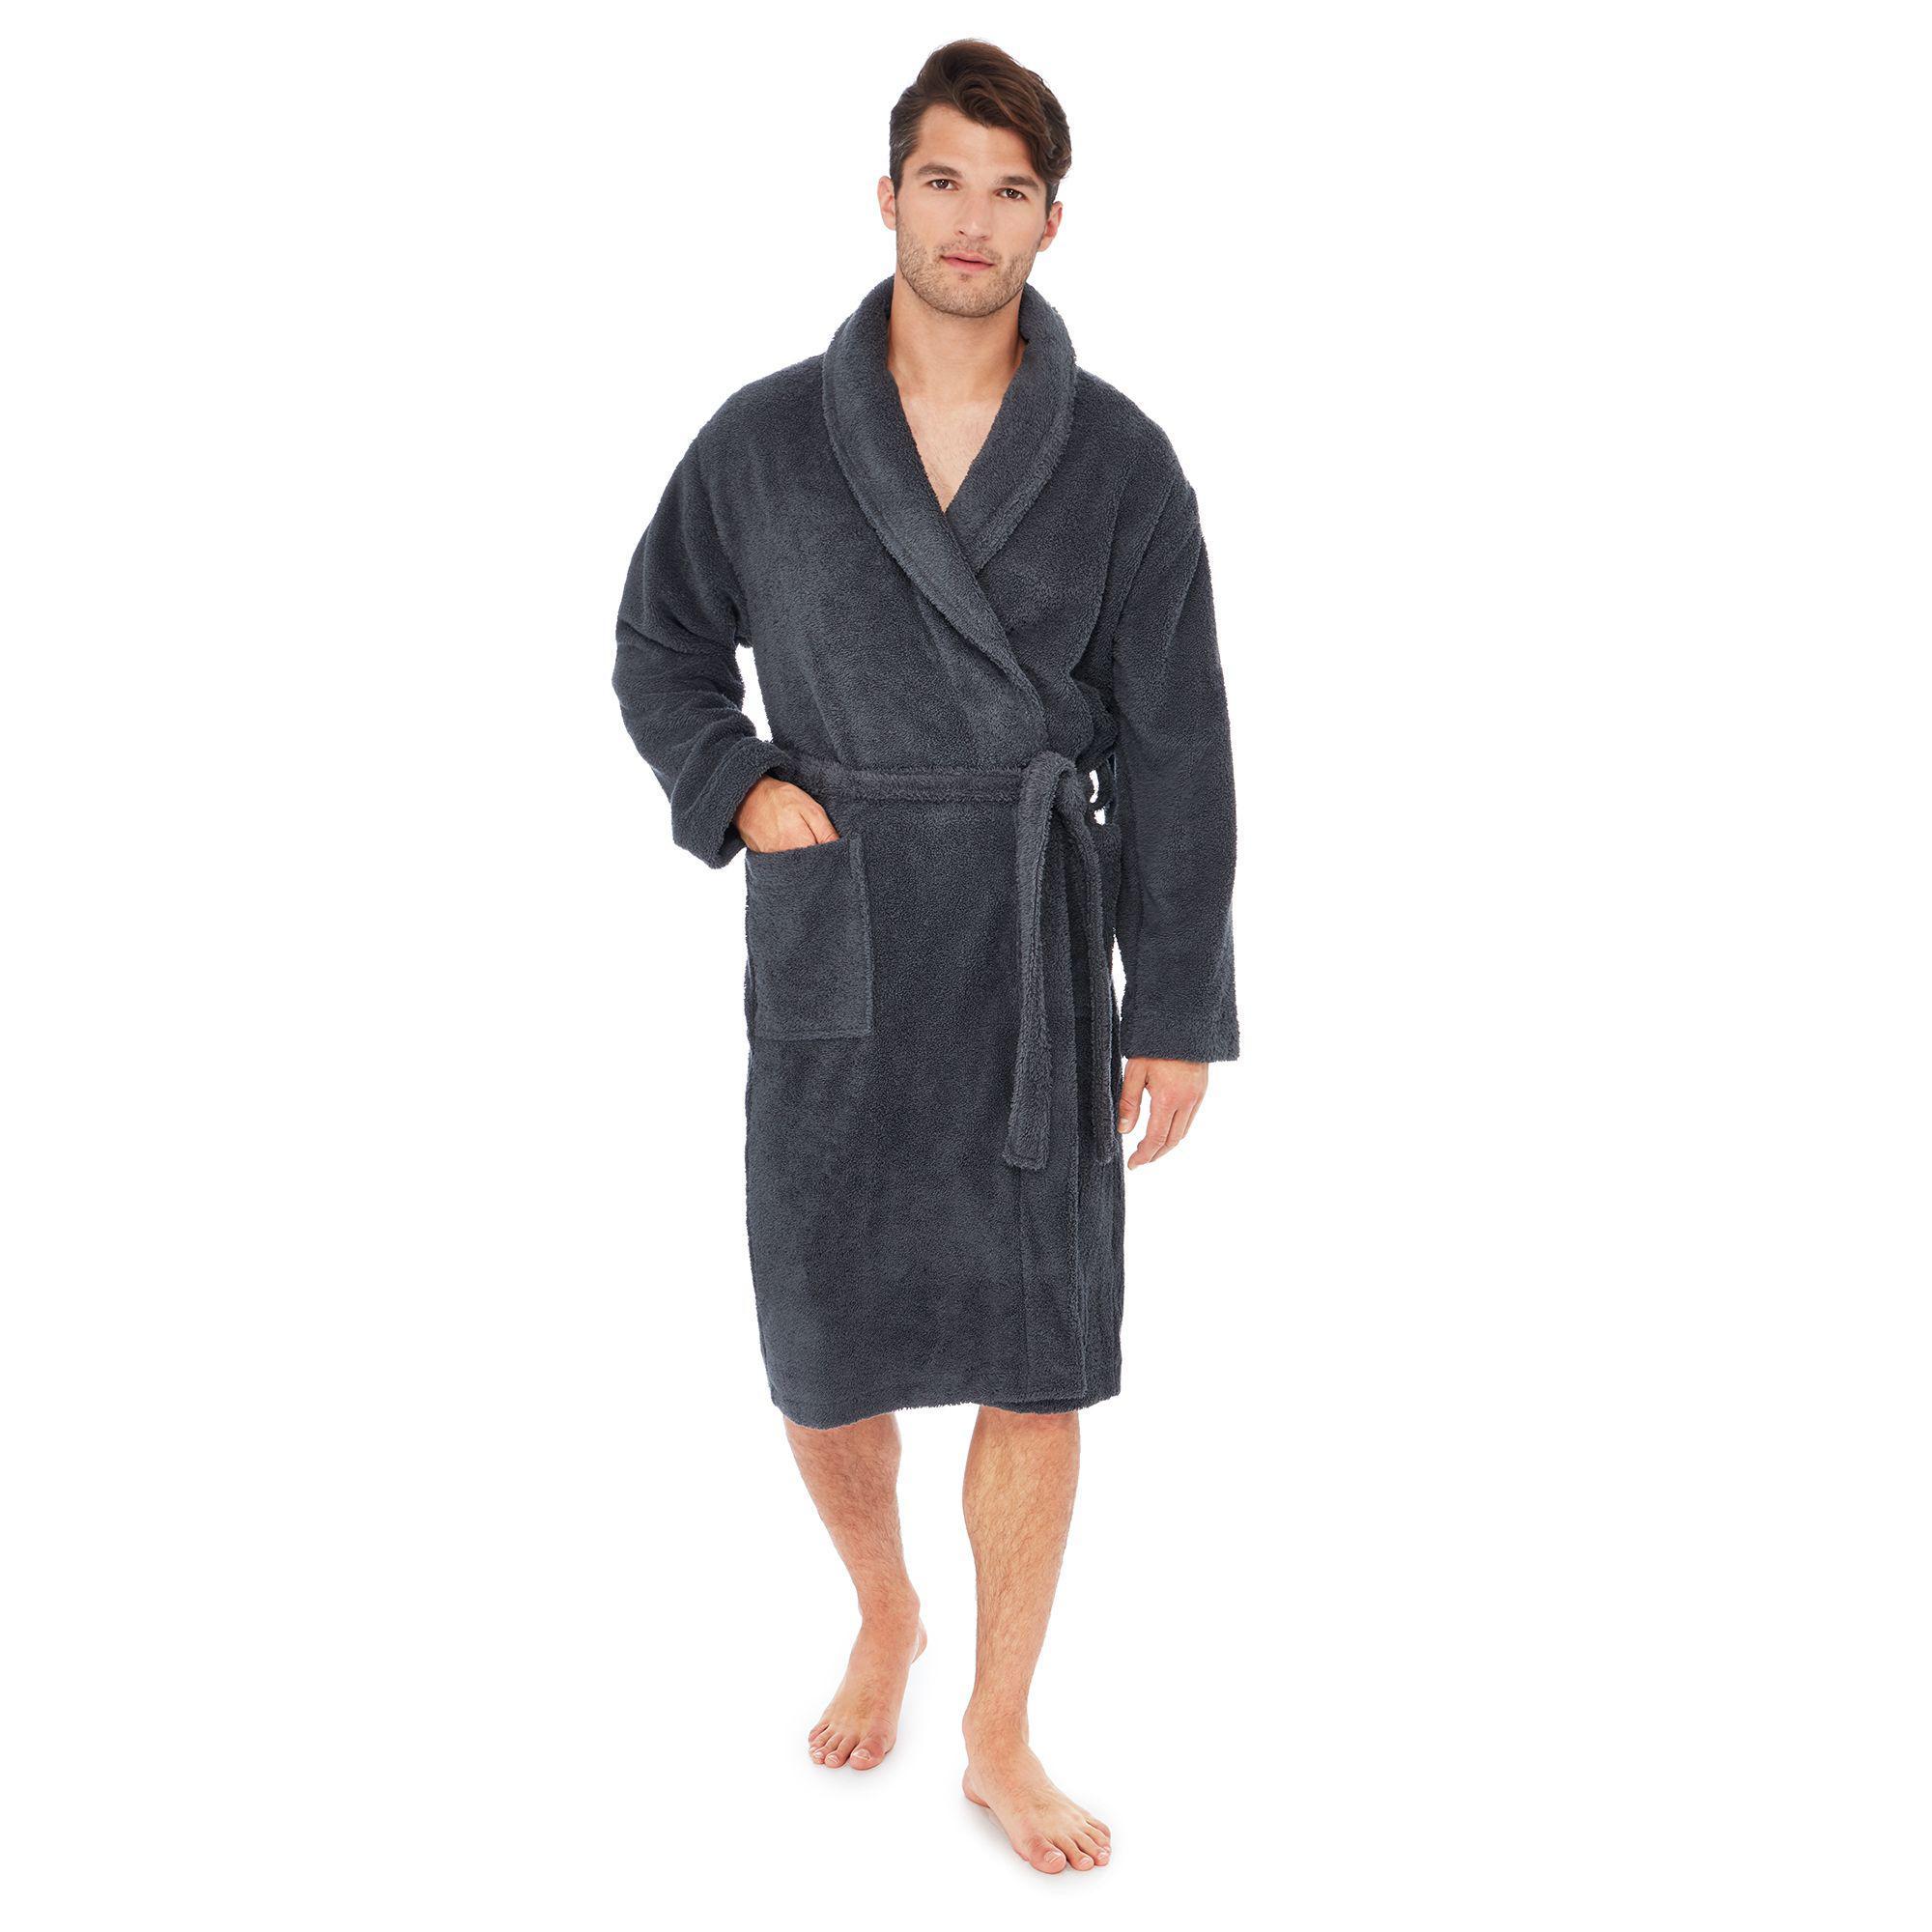 ad7bab26fe J By Jasper Conran Grey Cotton Rich Dressing Gown in Gray for Men - Lyst